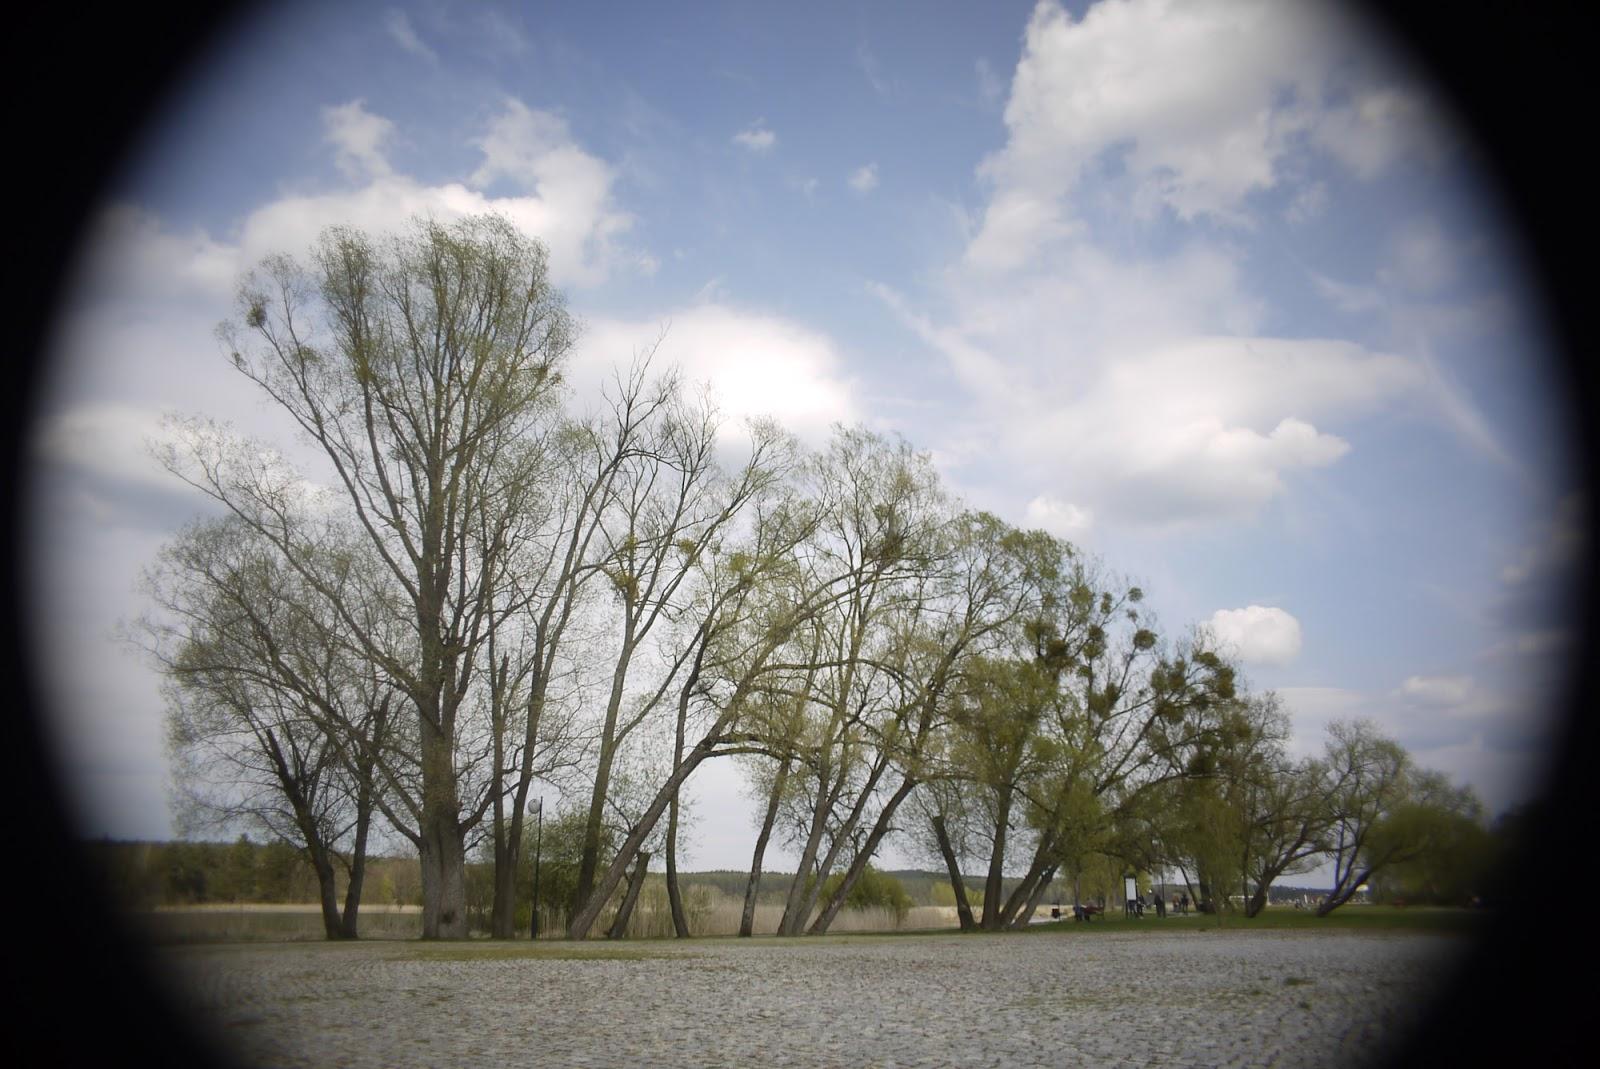 Cosmicar 12.5/1.9 @1.9 - landscape (2:3 crop).